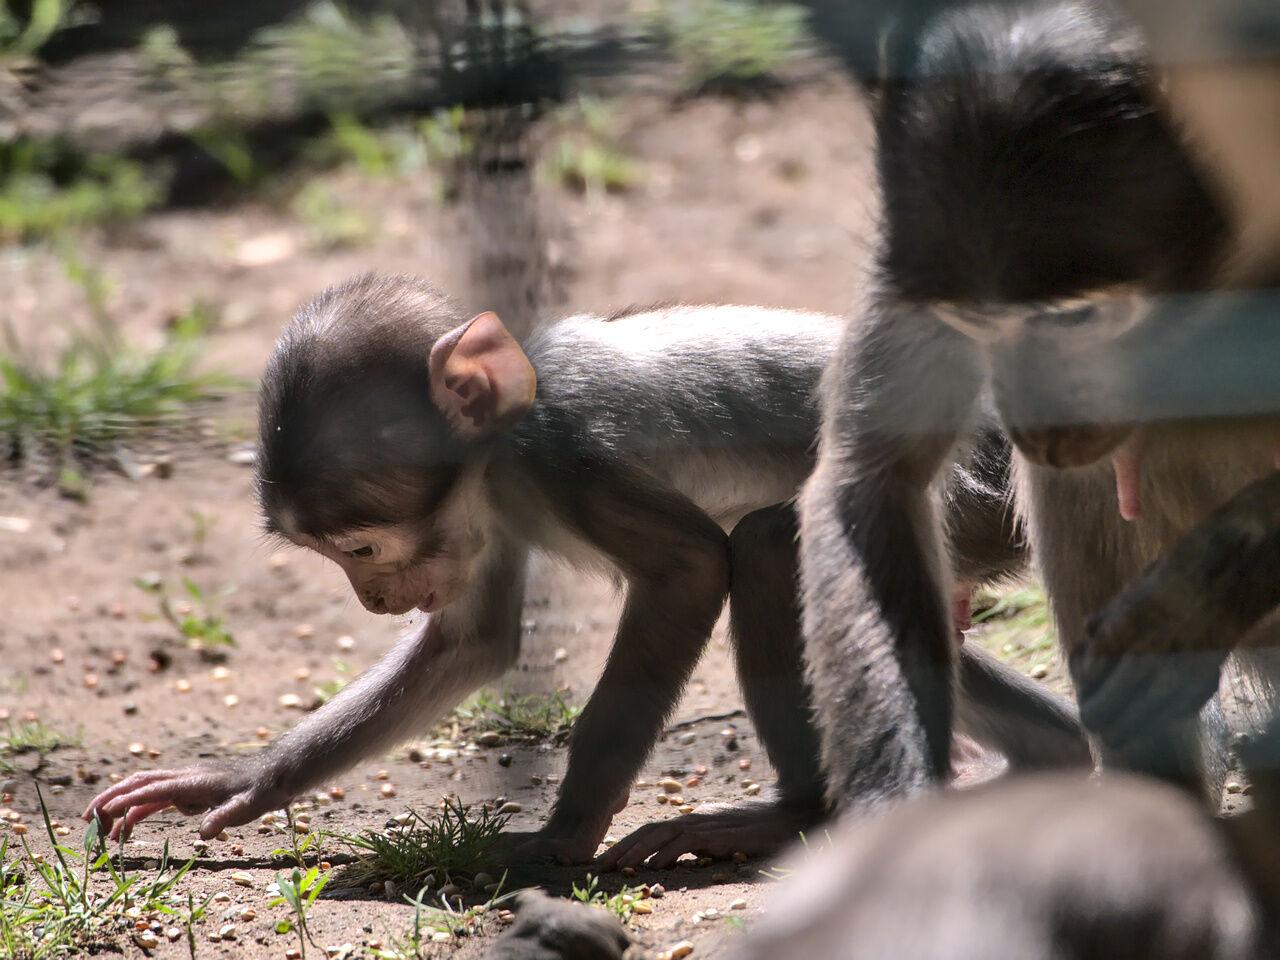 20200524_Zoo_Landau_062